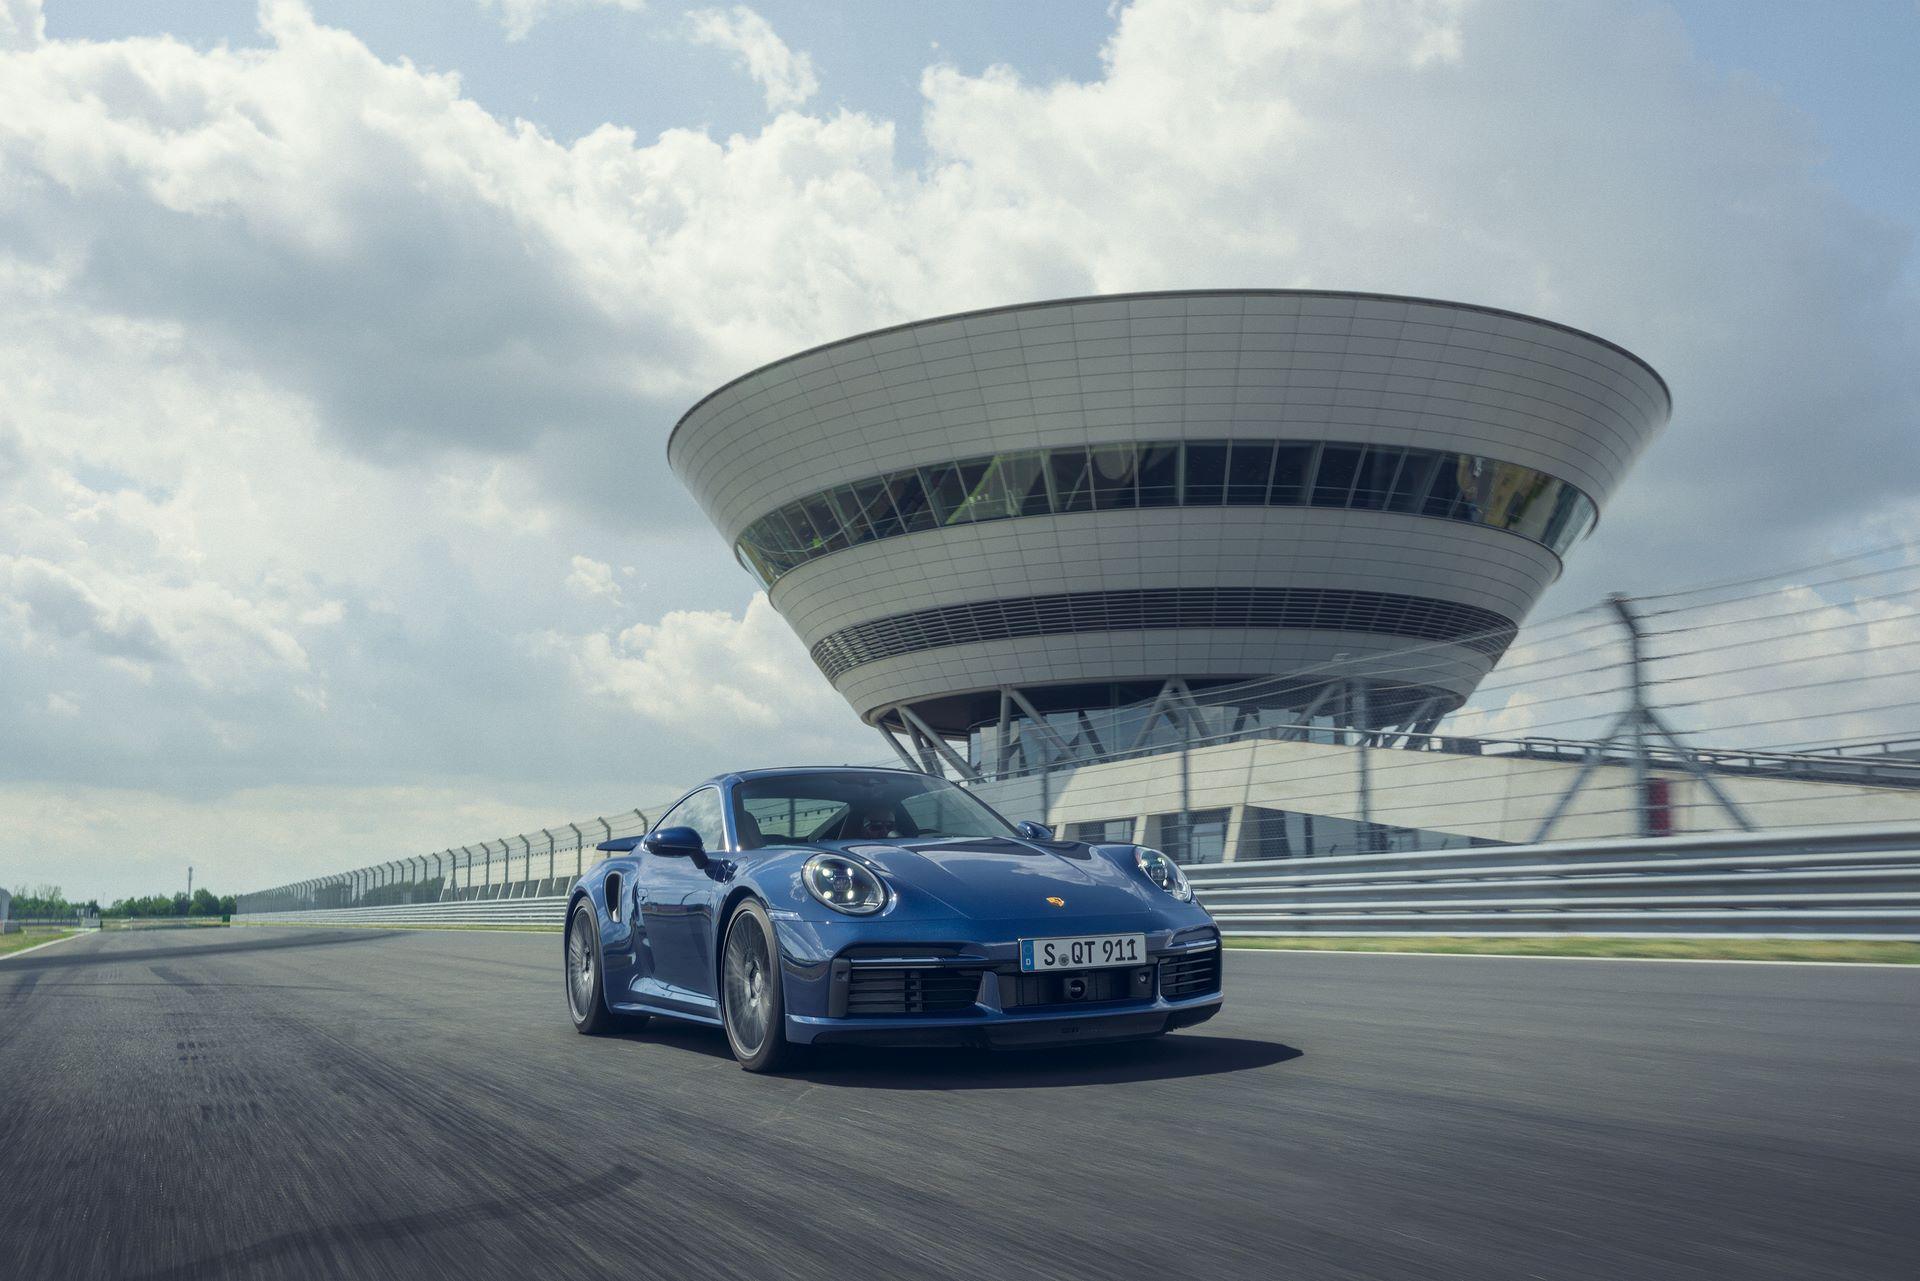 Porsche-911-Turbo-2020-4